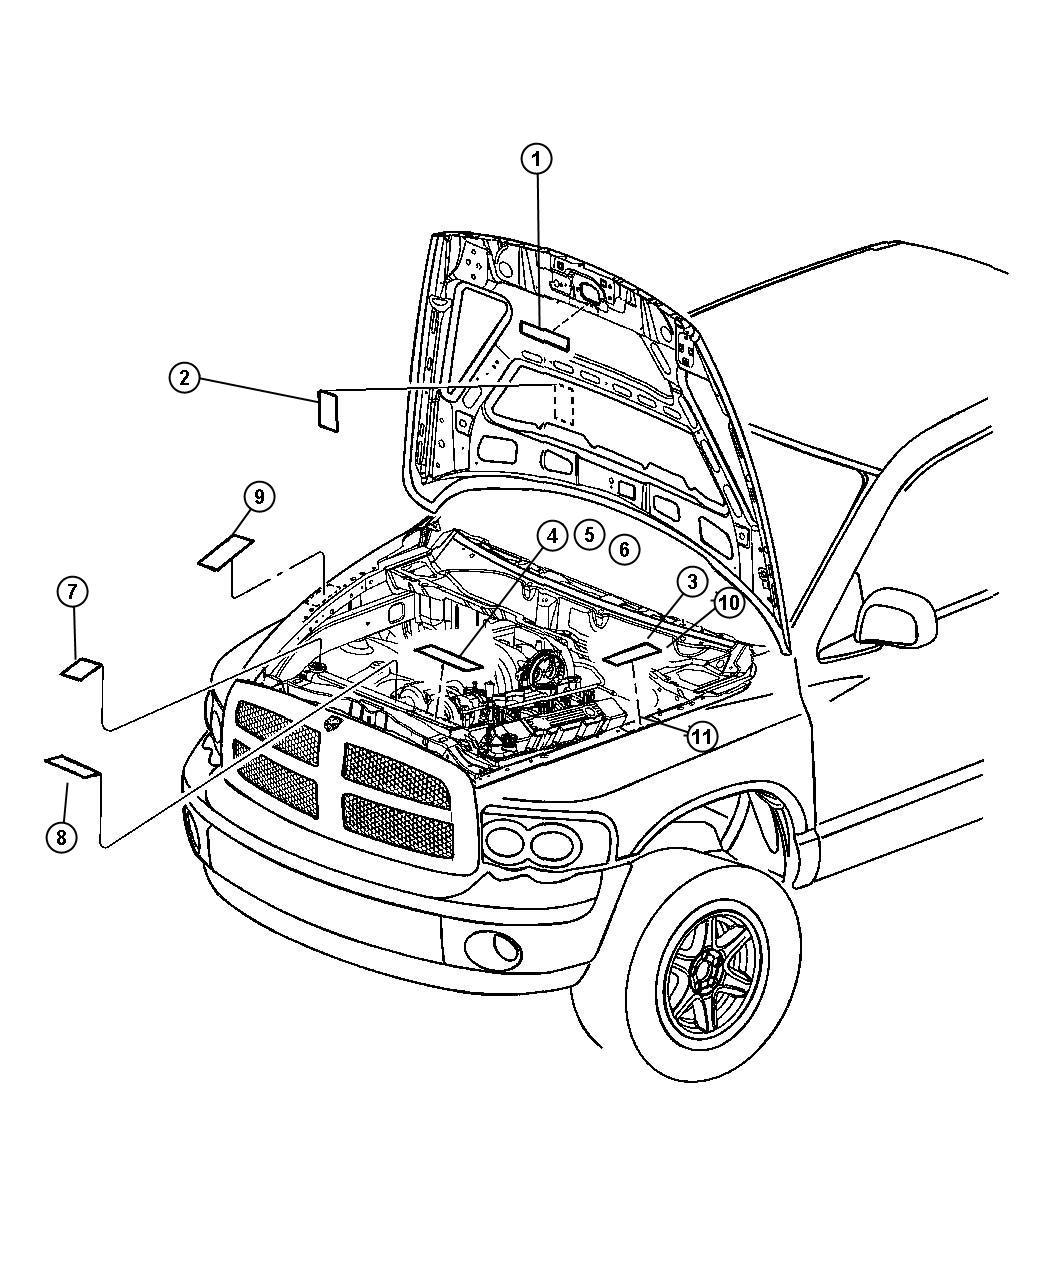 31 Dodge Ram Fuel Tank Diagram